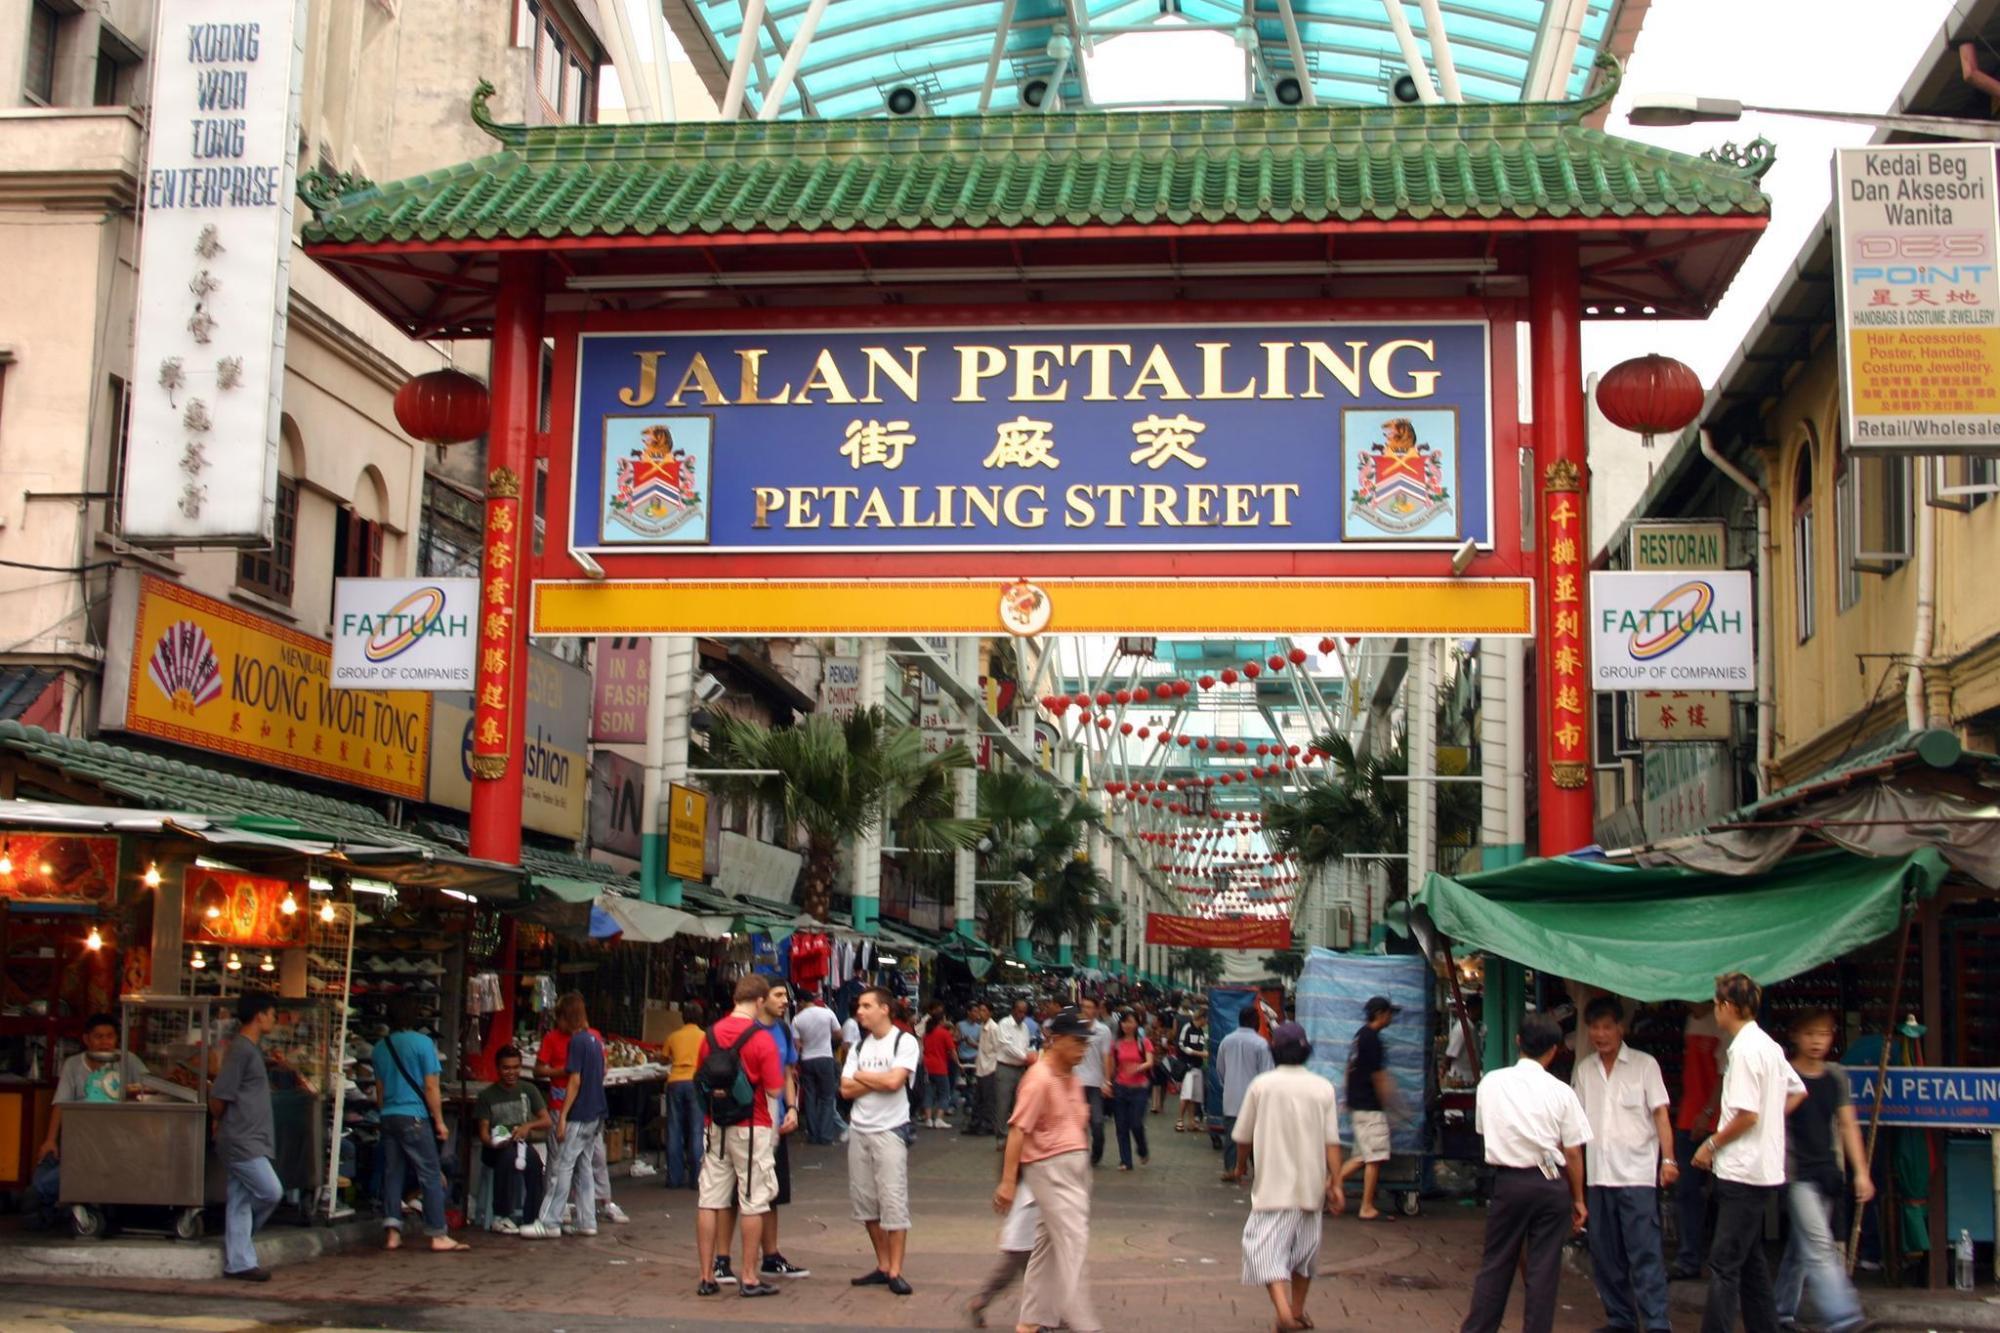 37a91c9cac82 Petaling Street Market